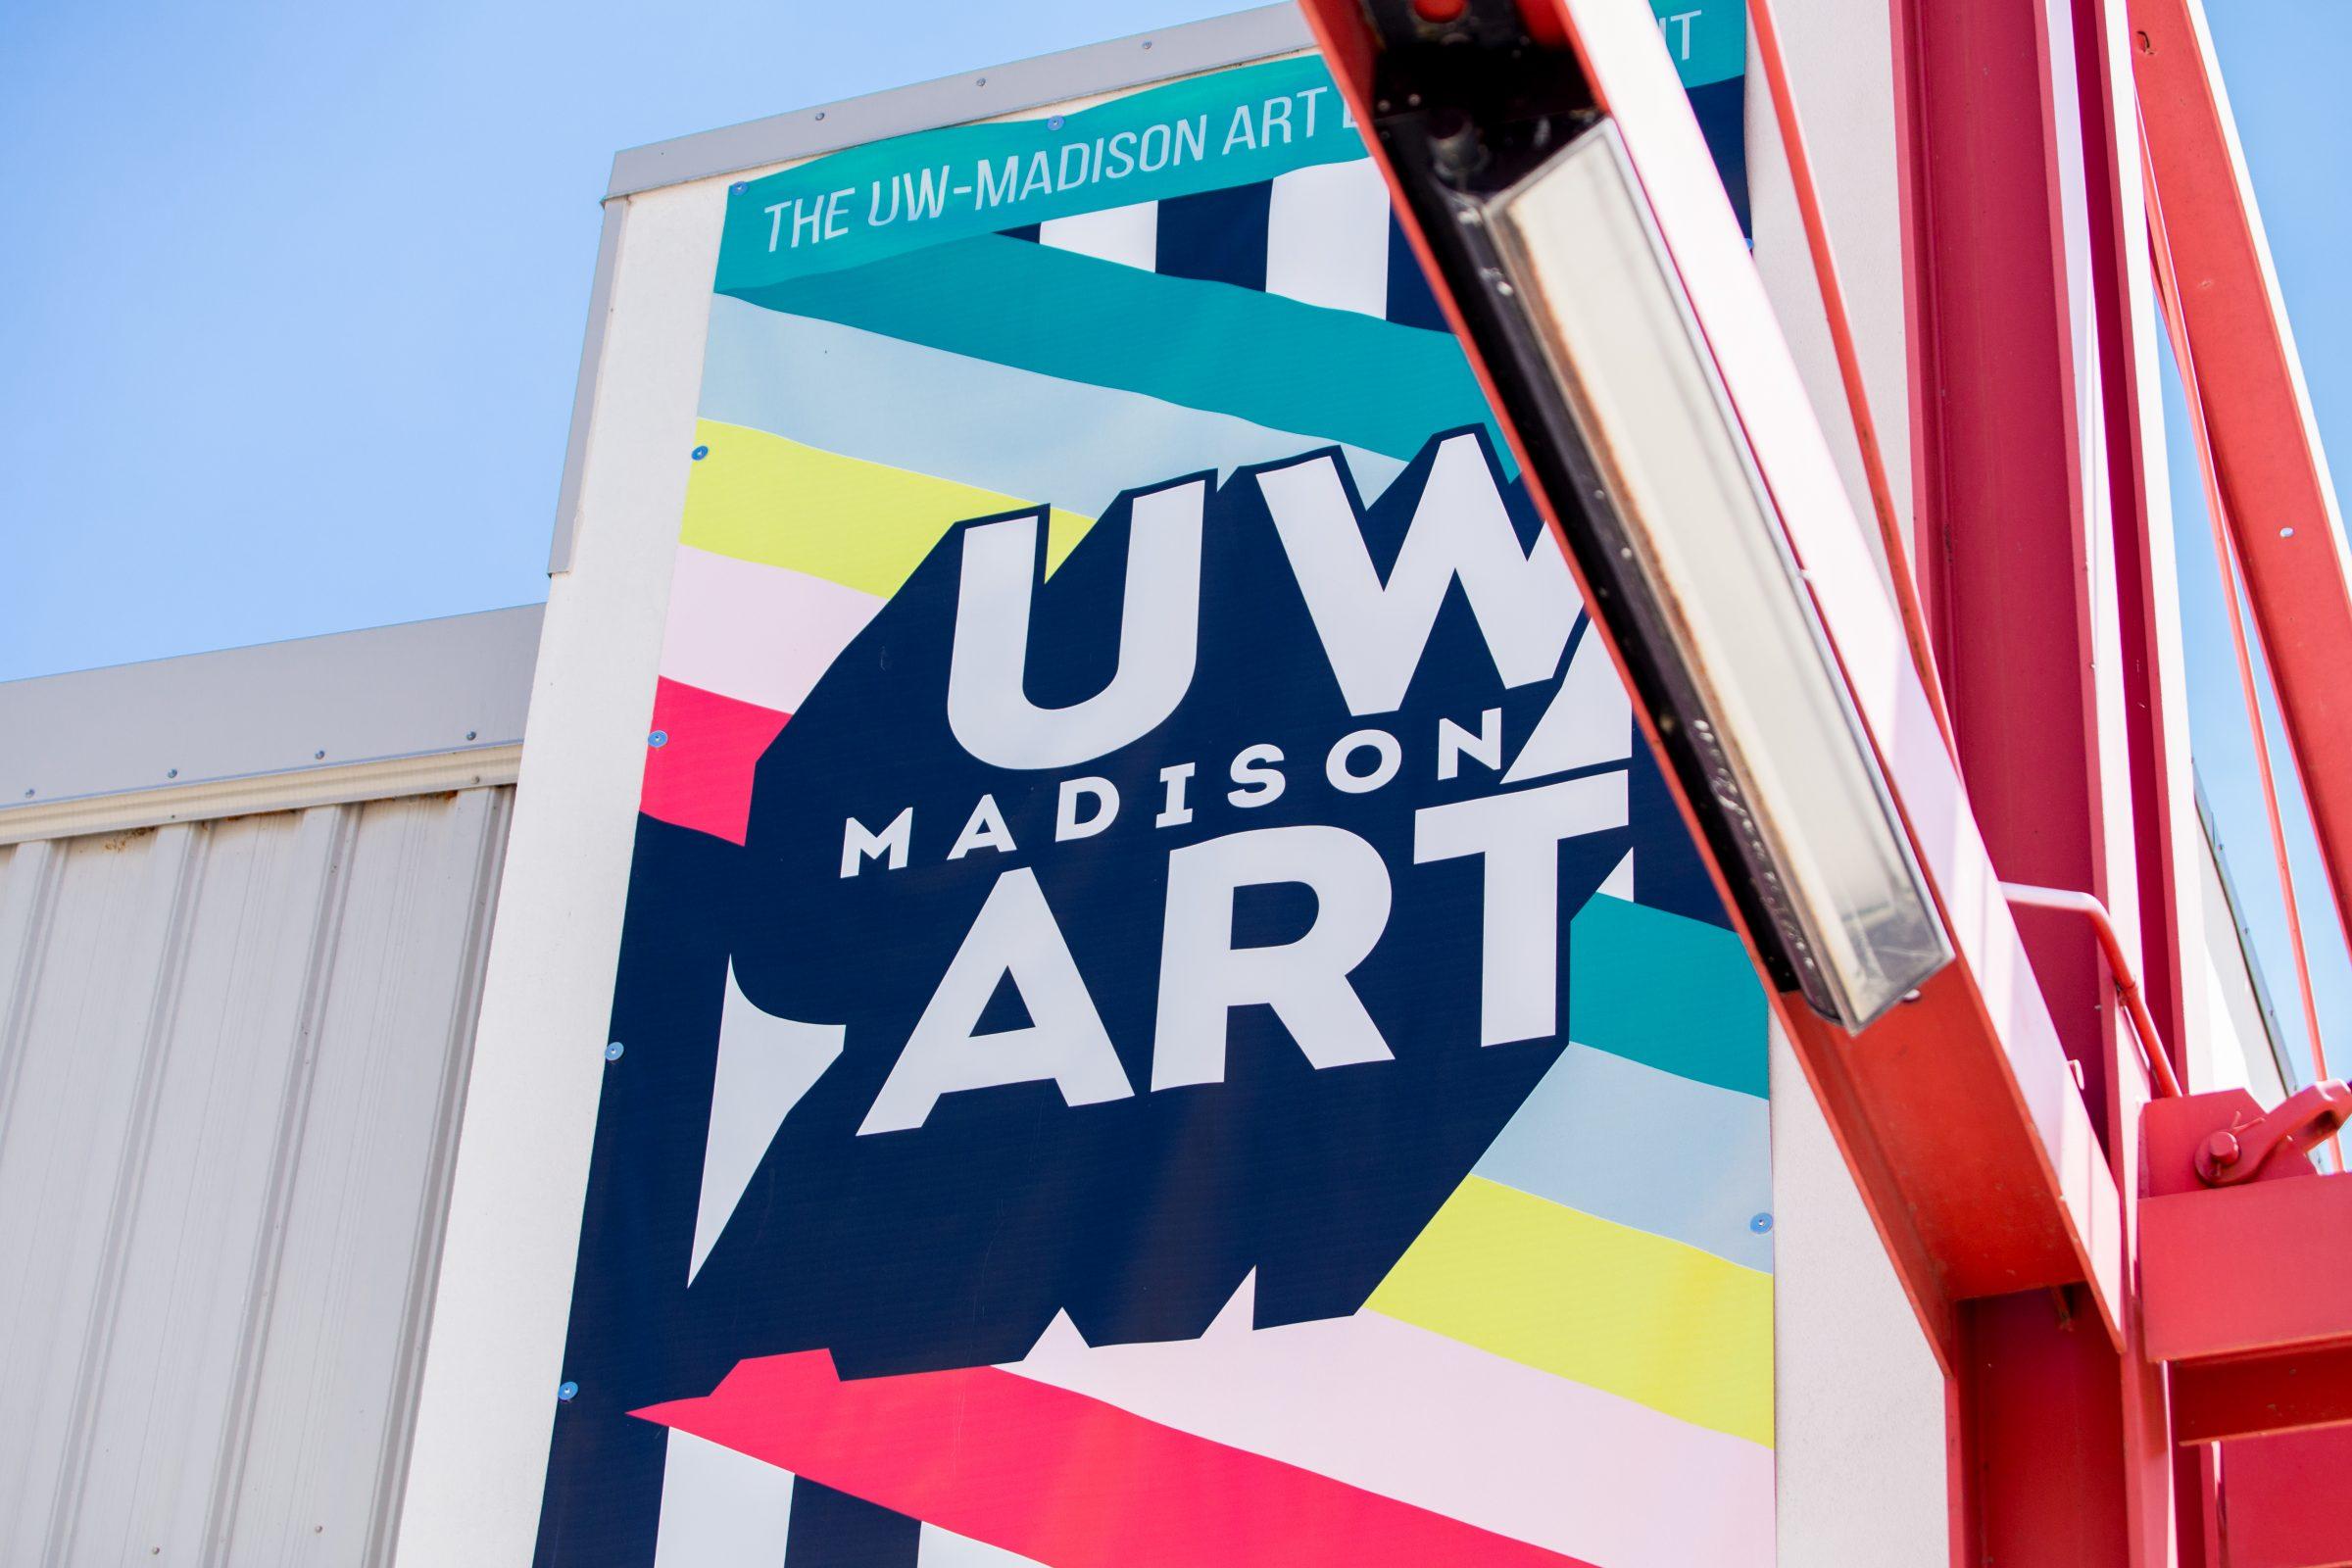 Art Lofts Building Exterior featuring the UW Art banner.